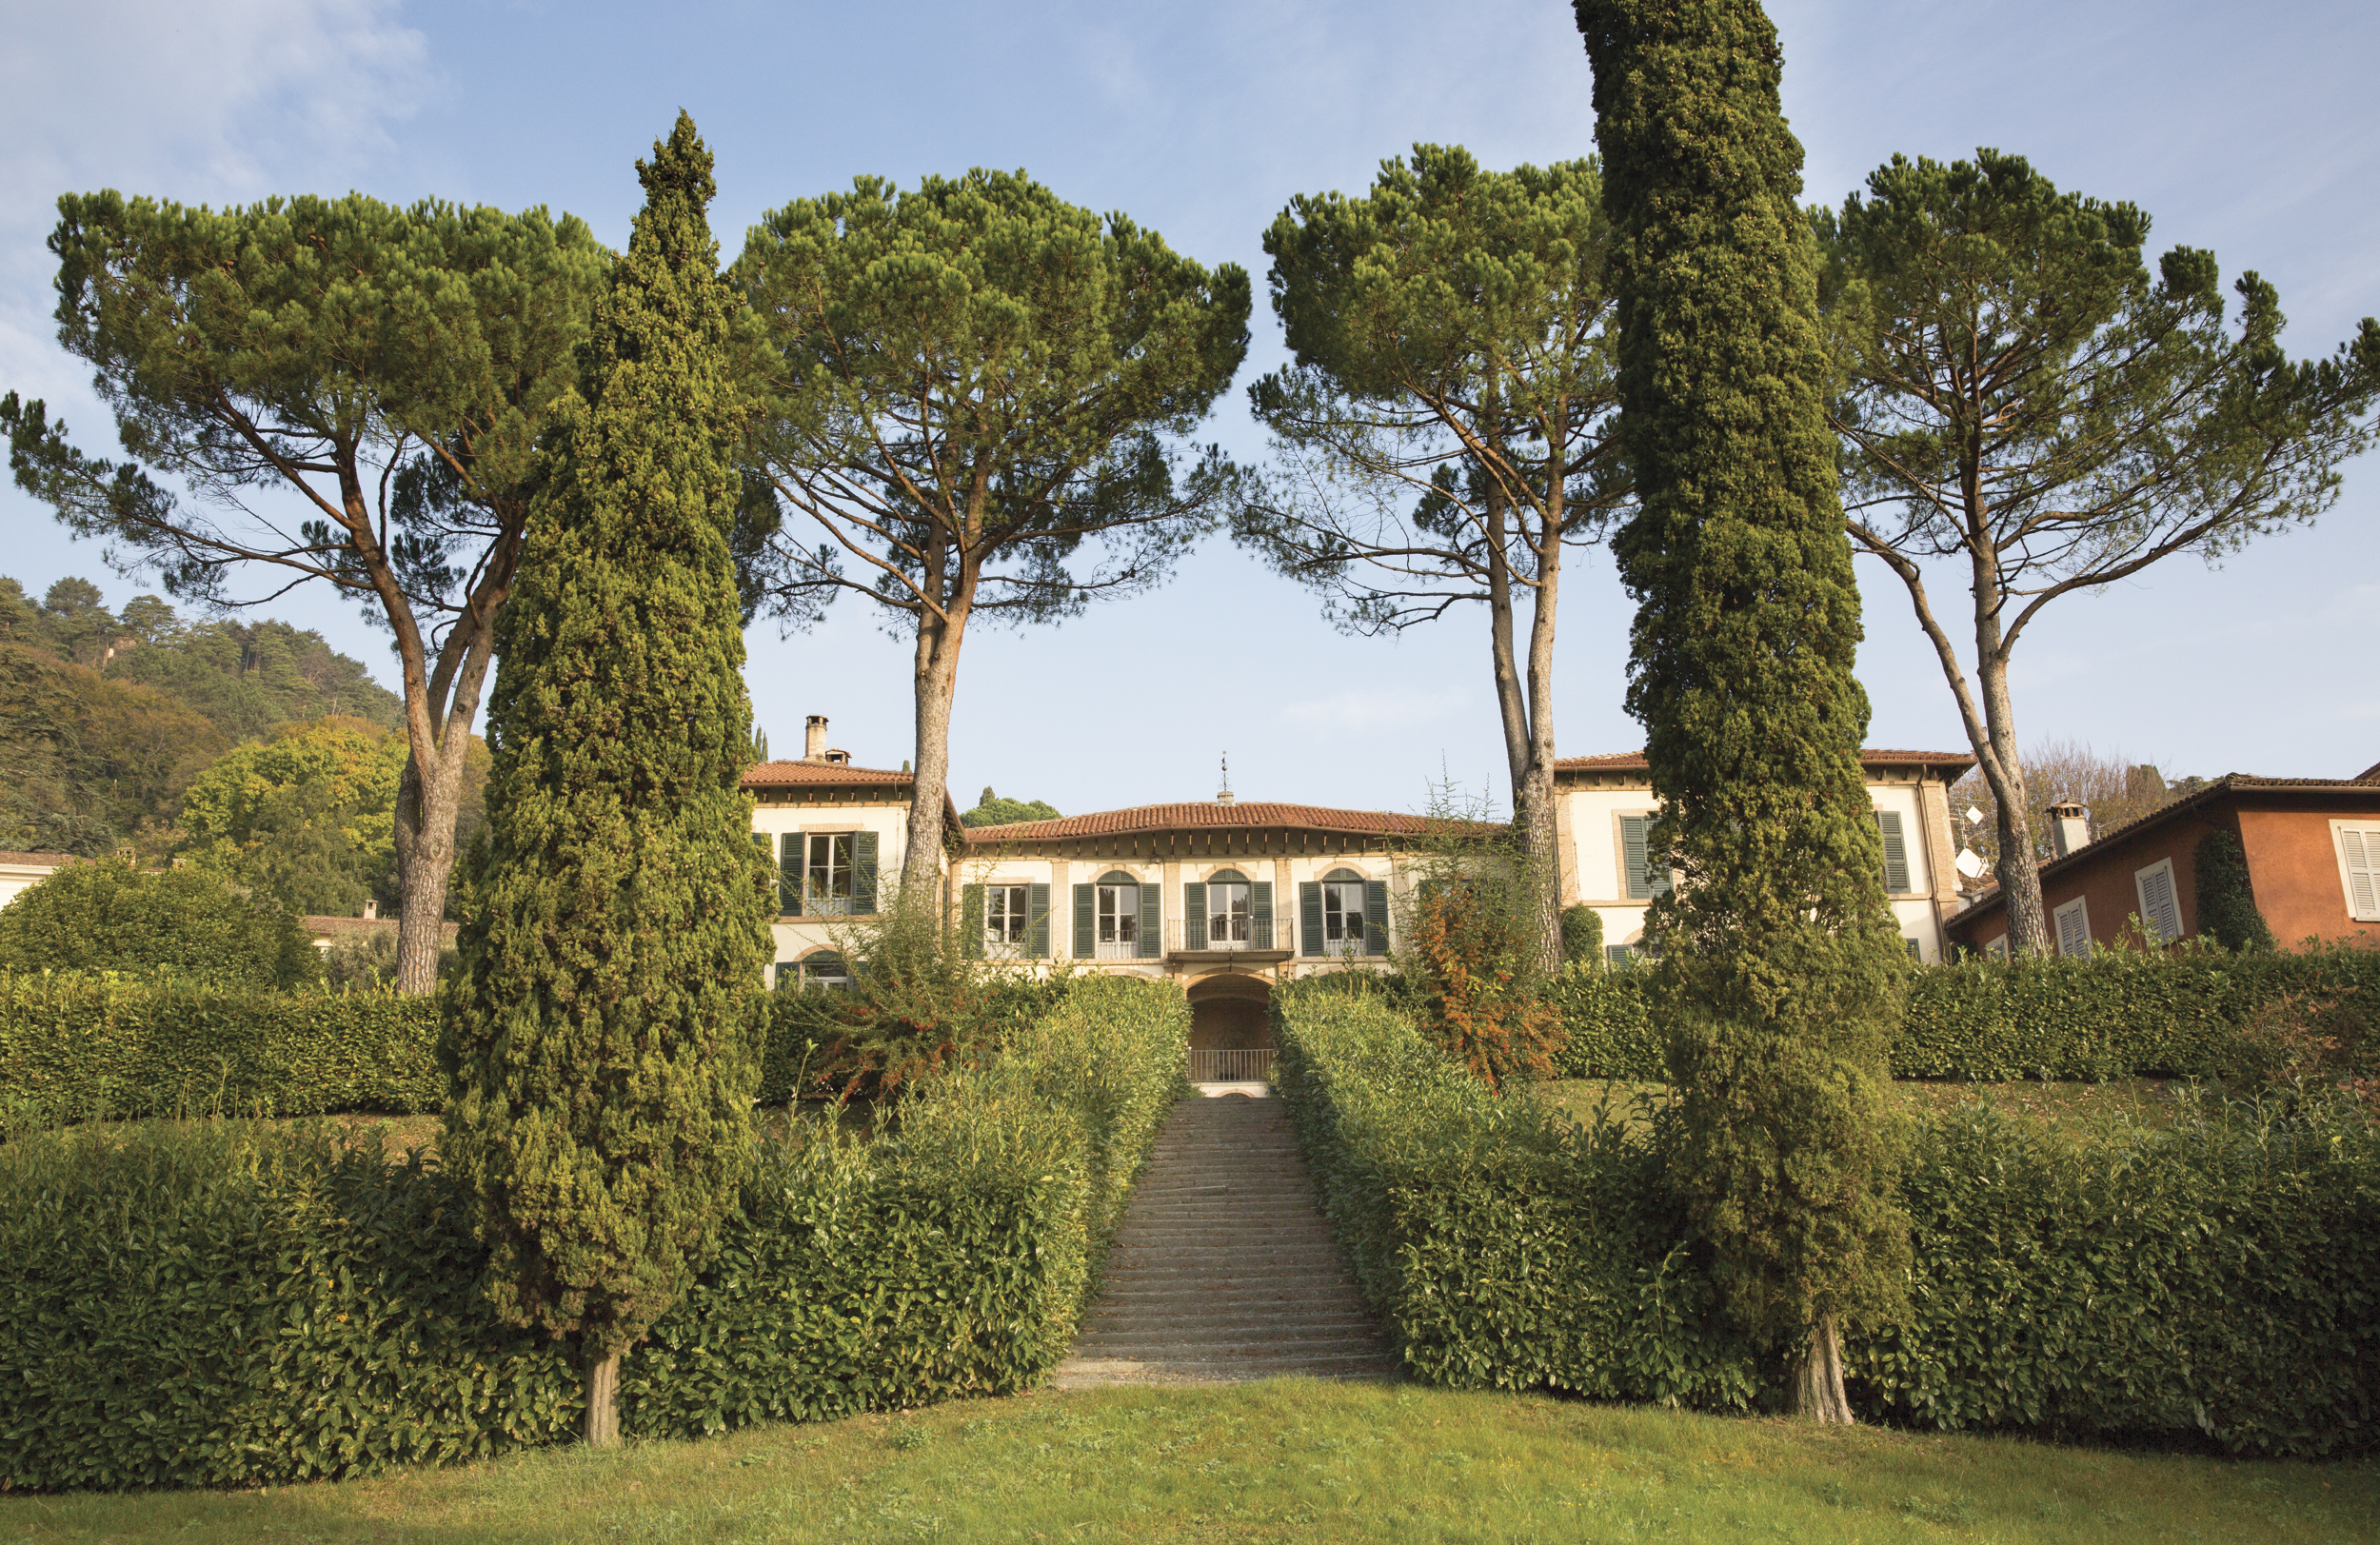 Villa Vigoni_2 GT Italy_BMW Foundation__Claudia Leisinger.jpg